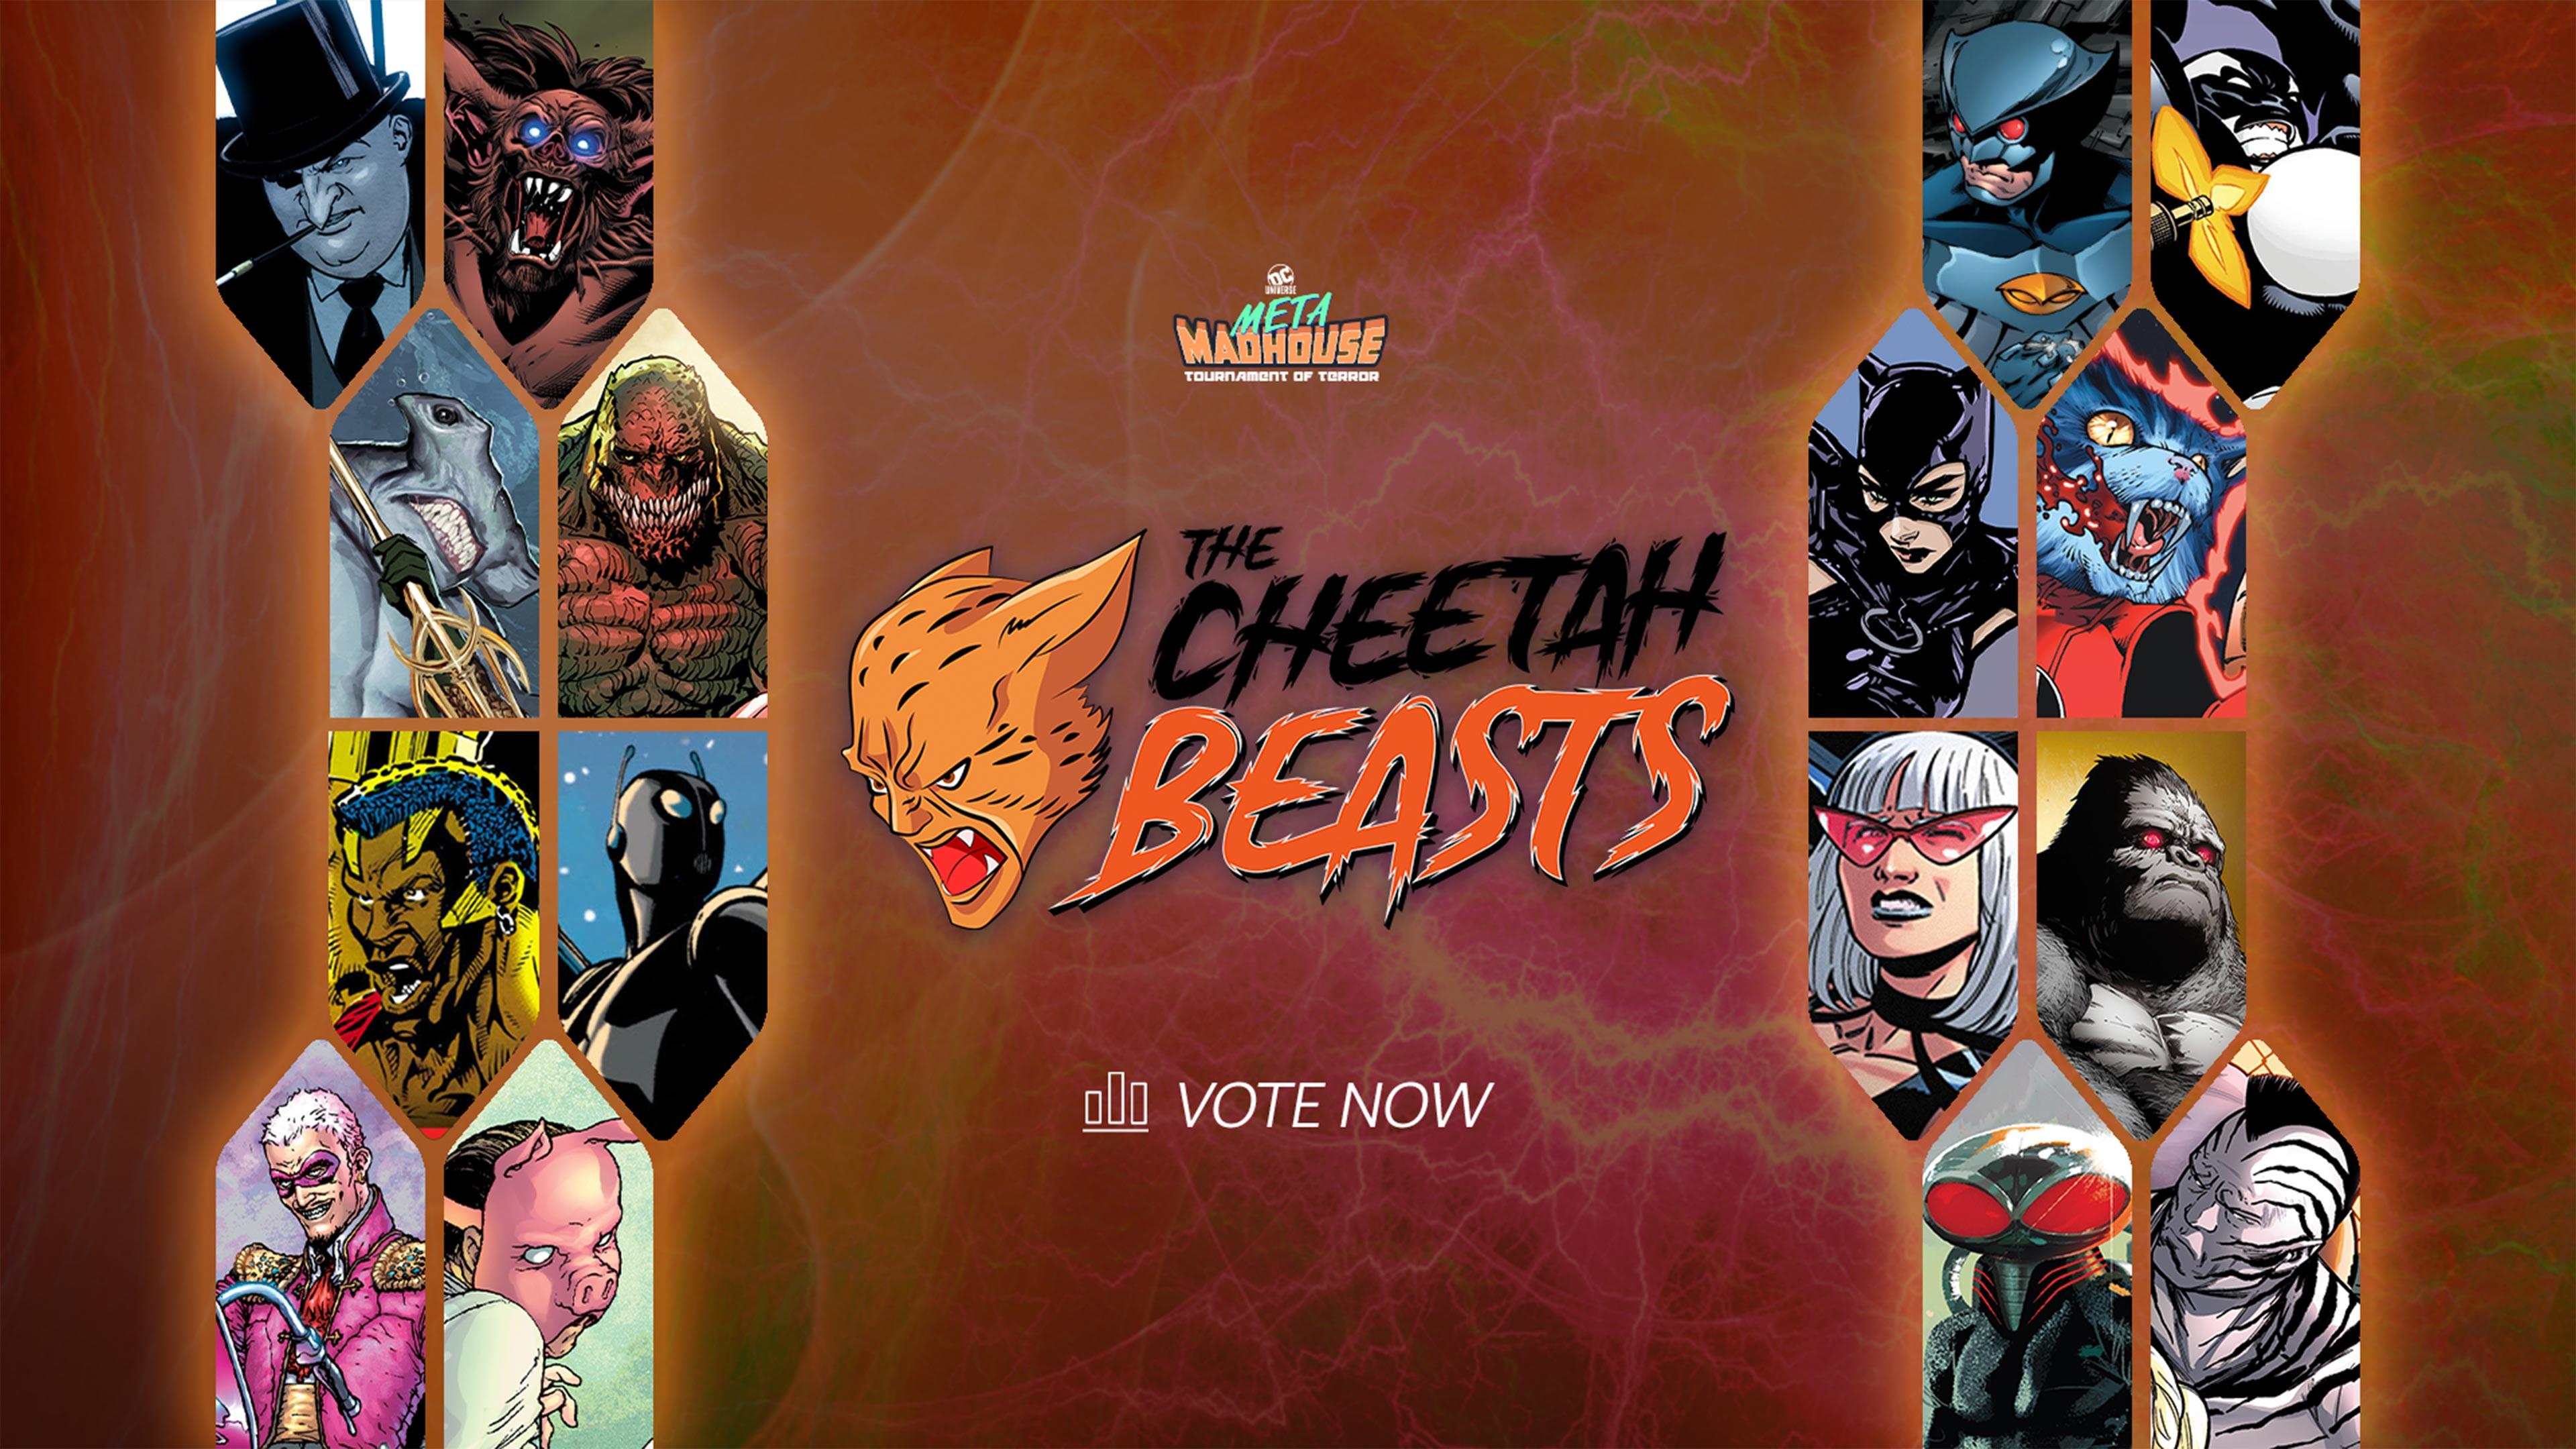 MM_CHEETAH_VOTE_16 players.jpg